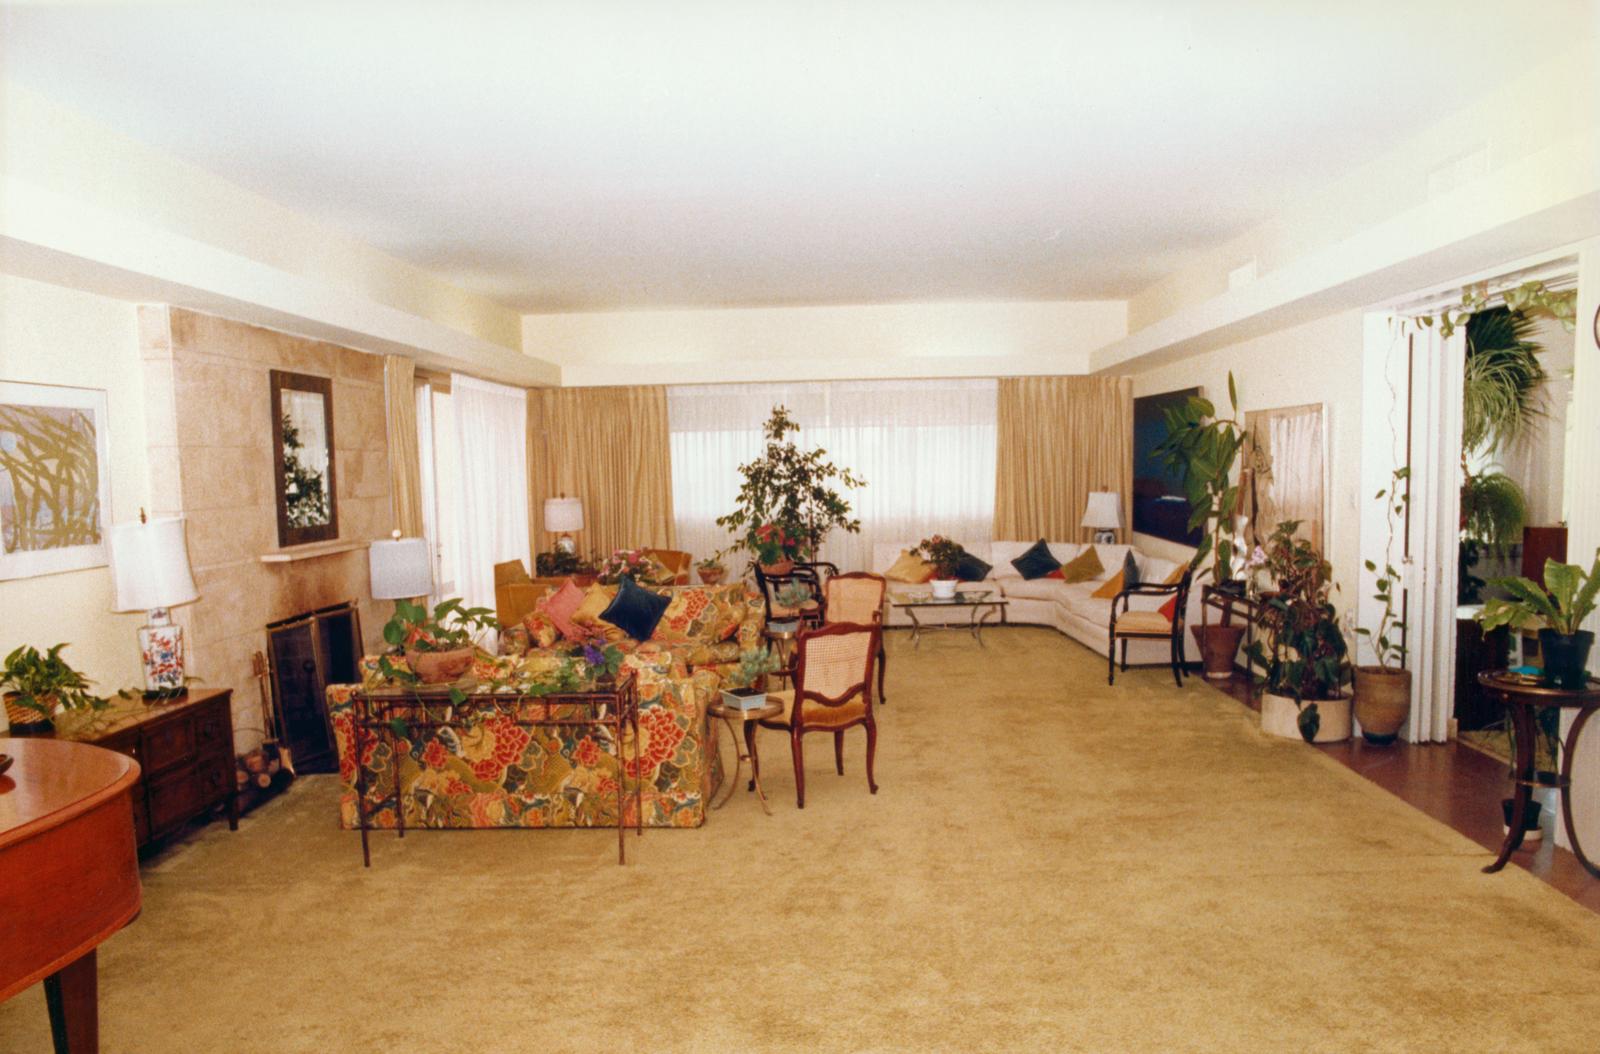 Tel Aviv - Embassy Mission Residence - 1985